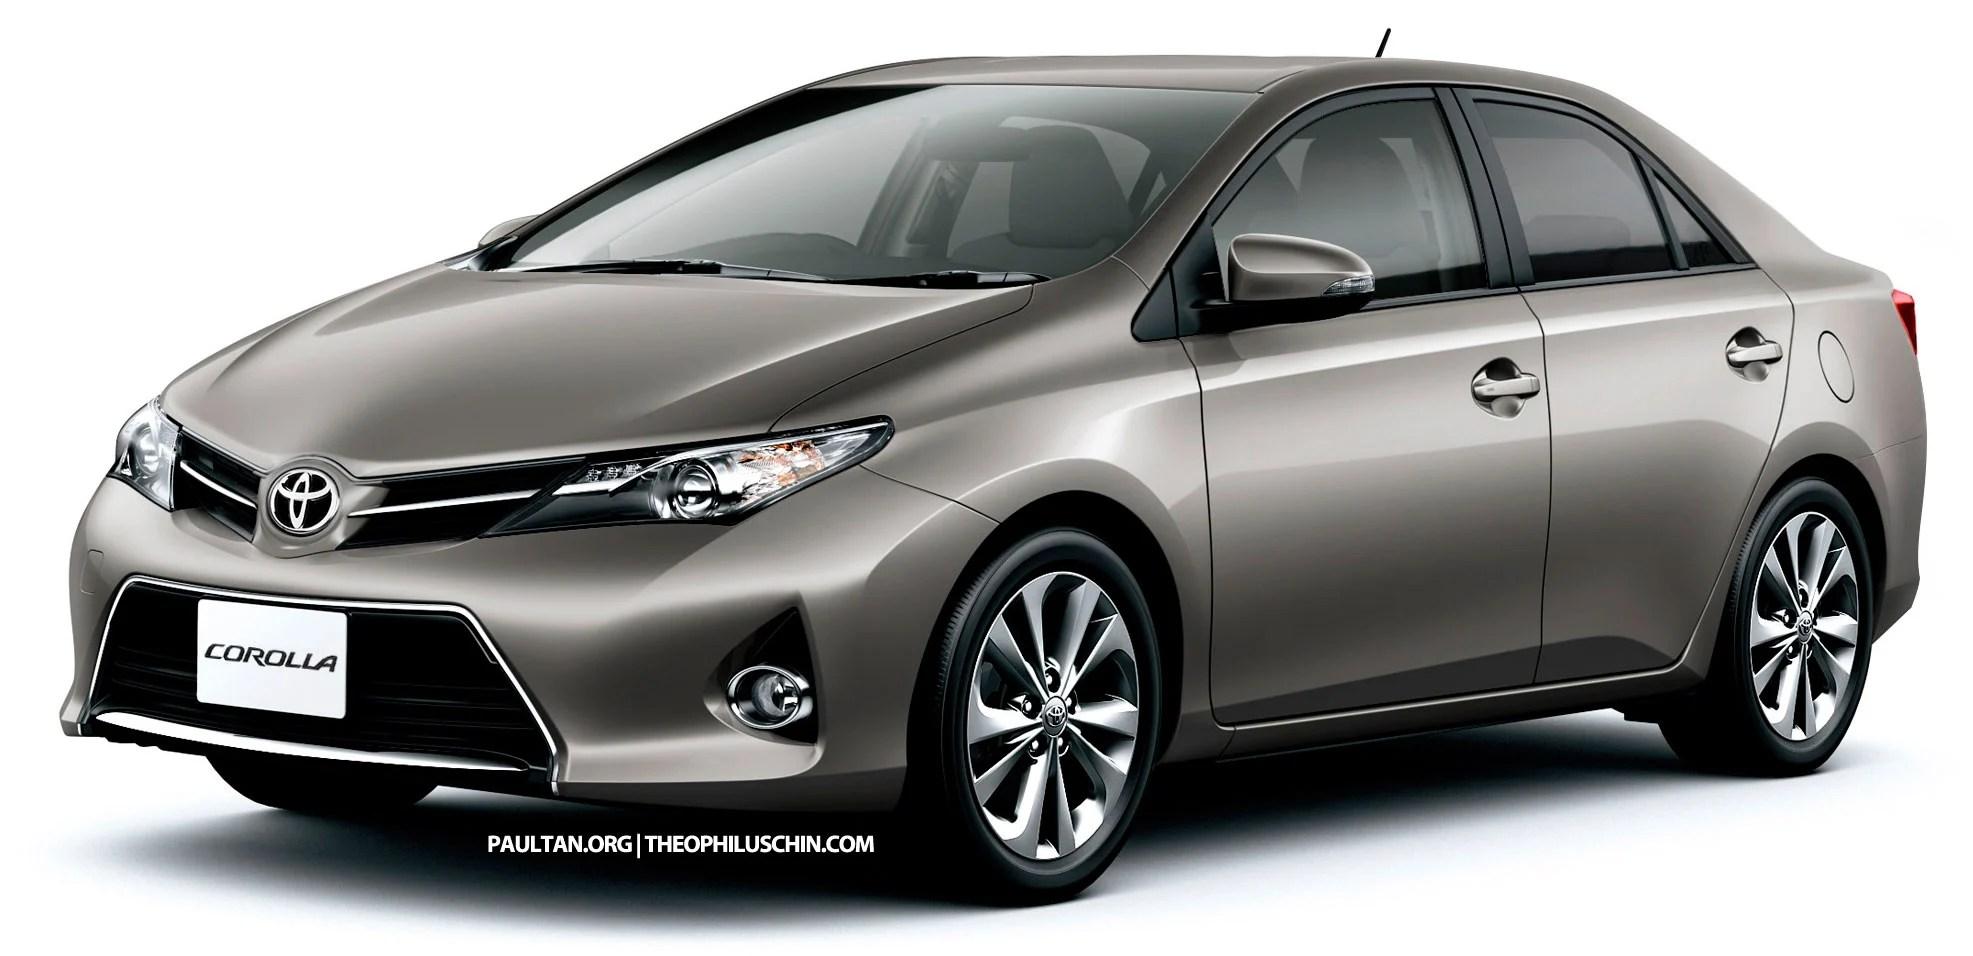 all new corolla altis 2018 kijang innova serayamotor toyota sedan to debut in 2013 paul tan ...